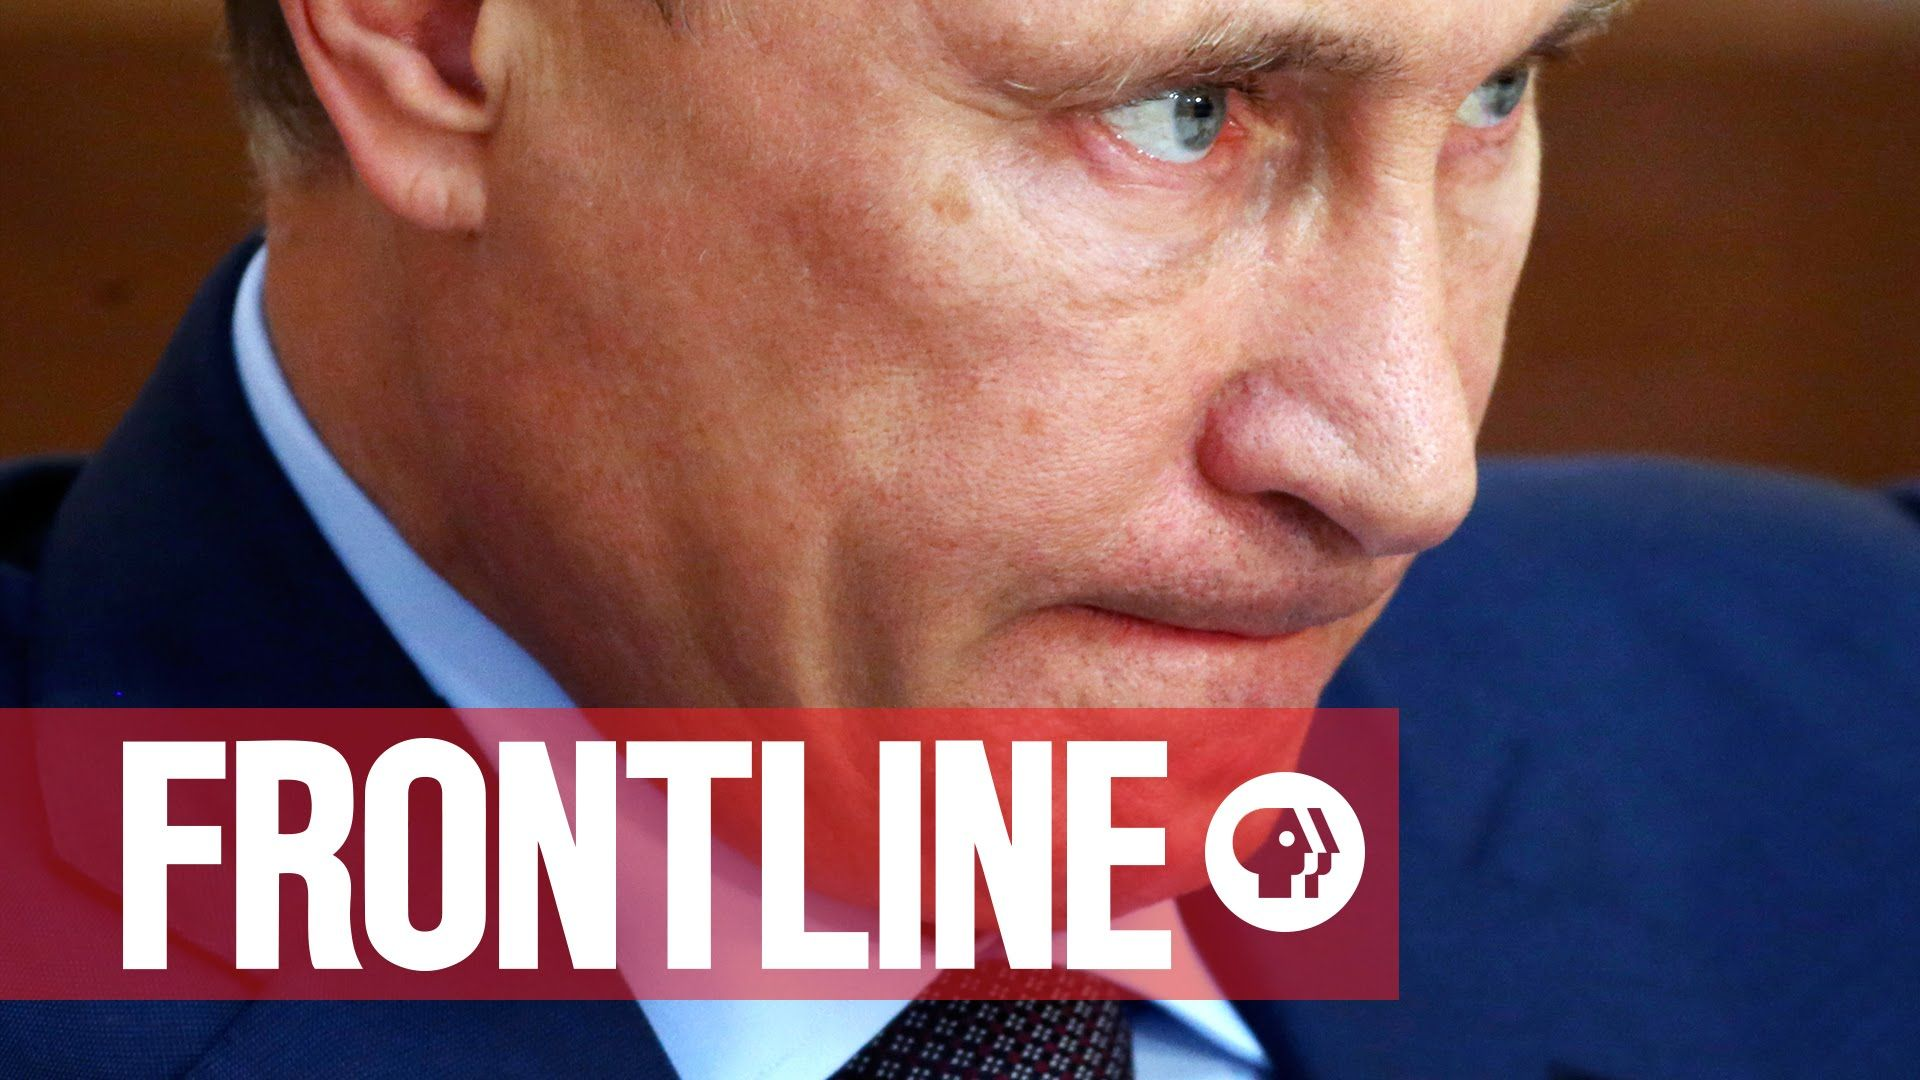 #teaparty #union #iww #occupy #ows #p2 #p21 #tlot #tcot   [VIDEO] Putin's Way - FRONTLINE - PBS   https://plus.google.com/u/0/photos/111262982046184002072/albums/6190089095003462881/6190089104810329298?pid=6190089104810329298&oid=111262982046184002072